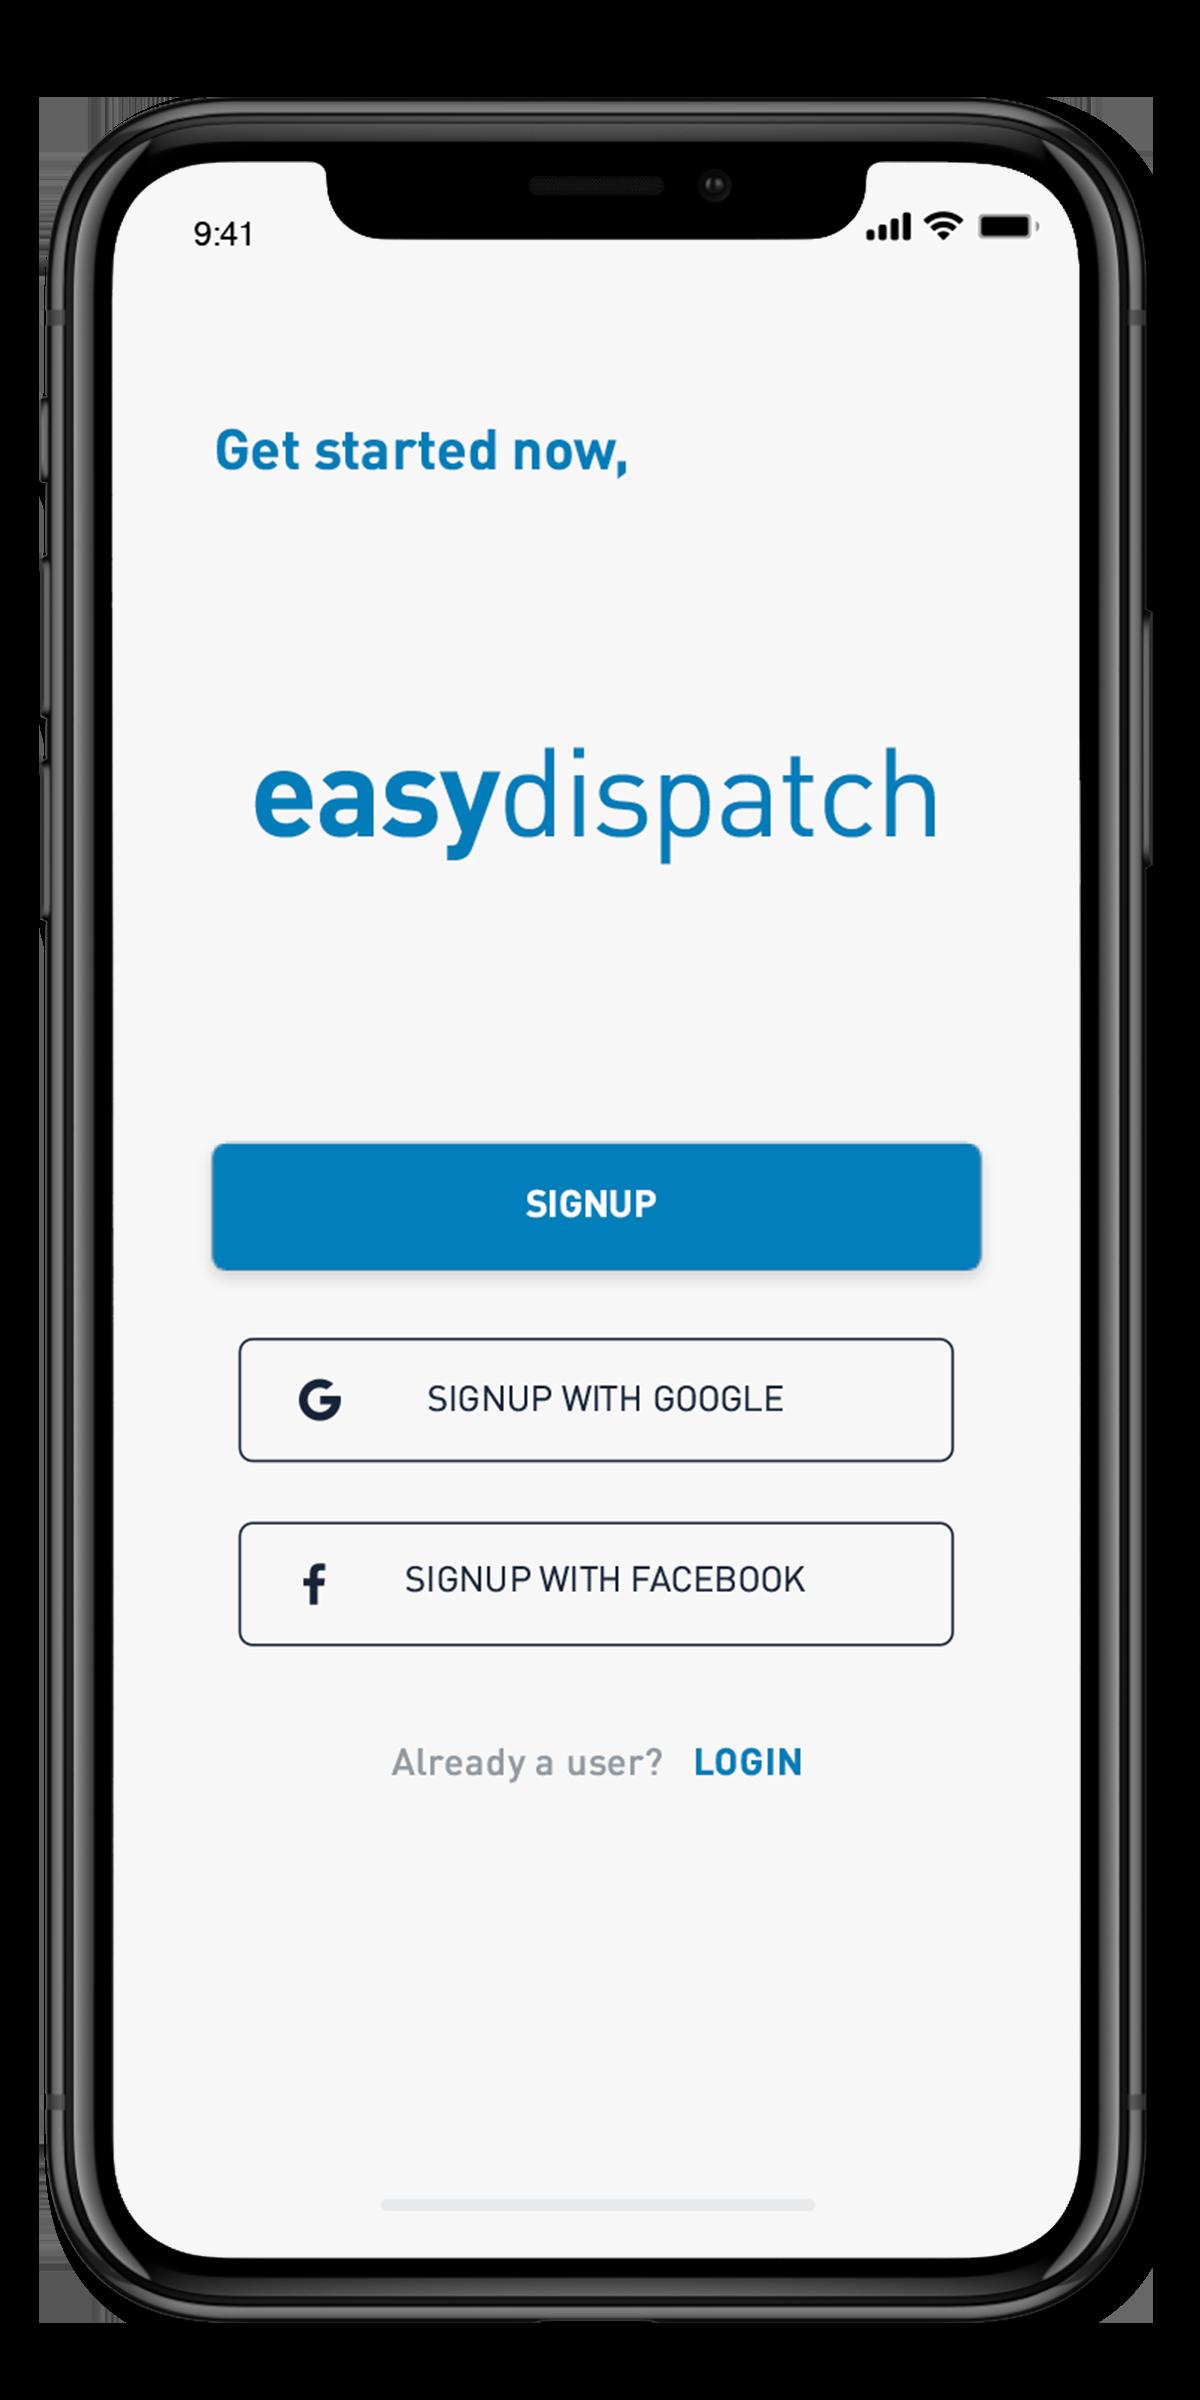 EasyDispatch - Welcome